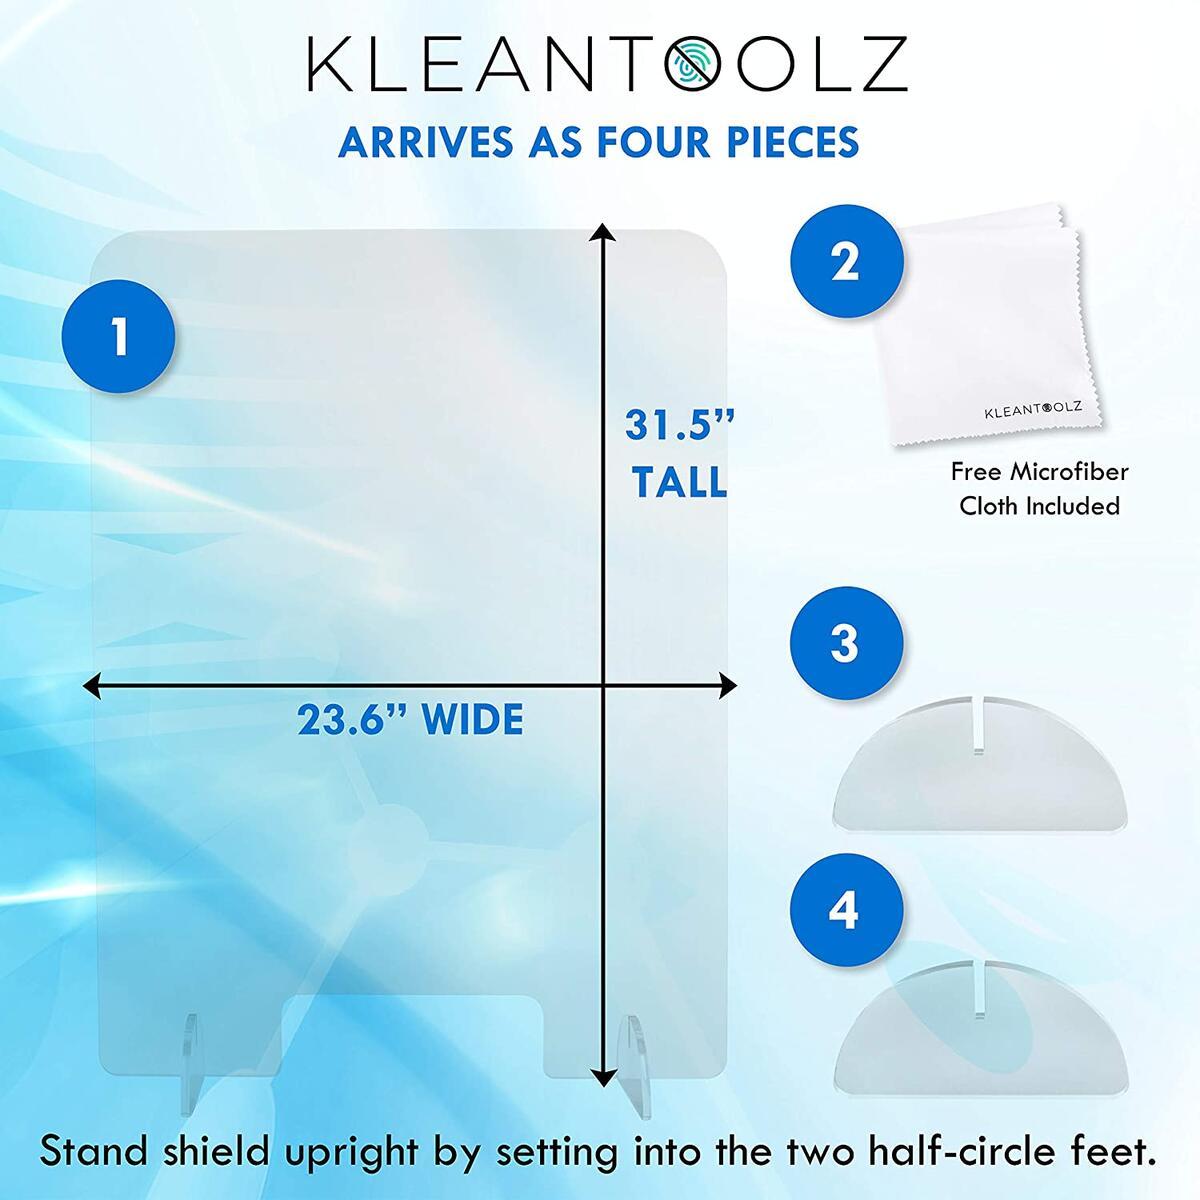 Clear Plexiglass Acrylic Protective Sneeze Guard Counter Shield Plexi Glass Screen Divider Barrier for Reception Office School Salon Partition Window (24